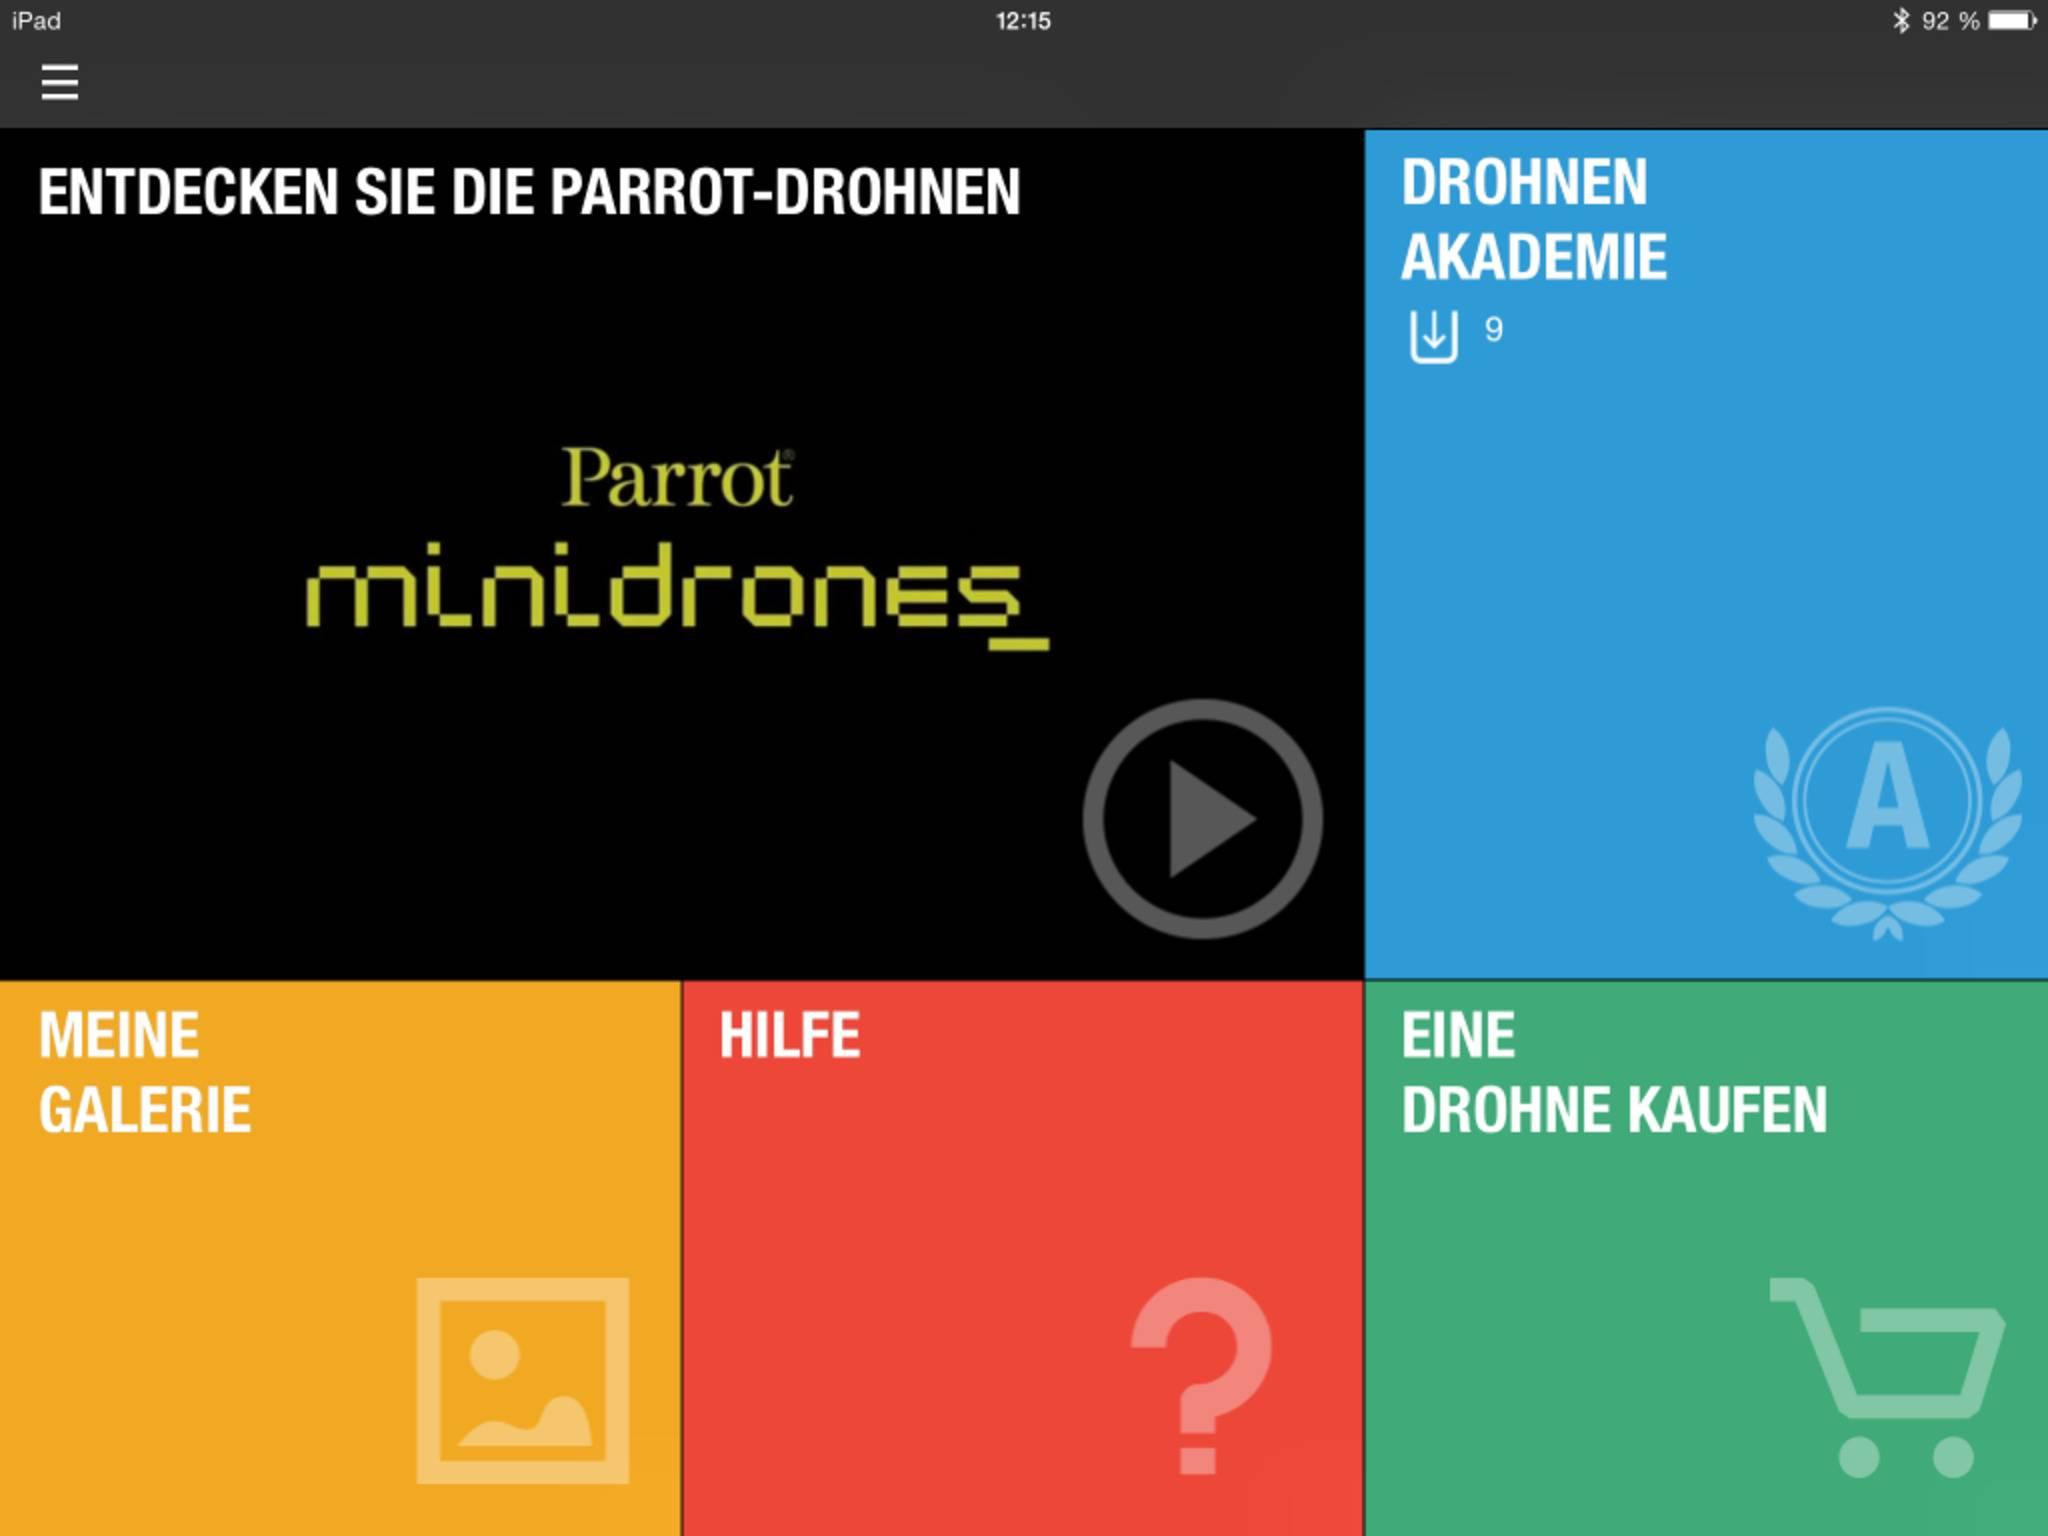 Gesteuert wird die Parrot-Drohne via App.